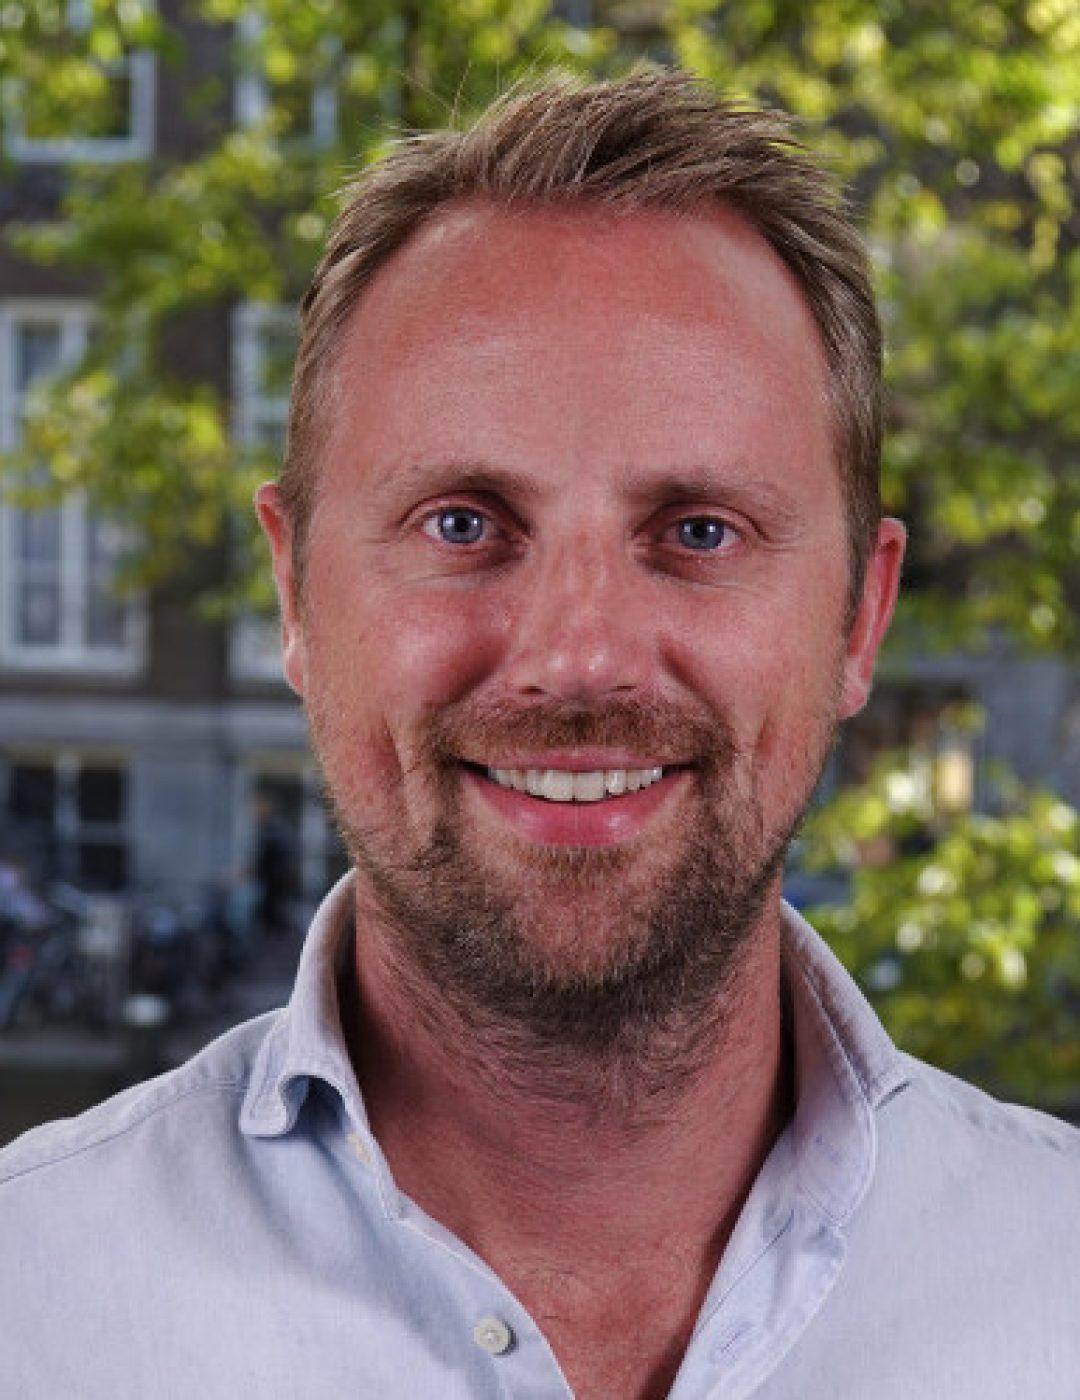 Derk van Wingerden, co-founder of Riverdam.